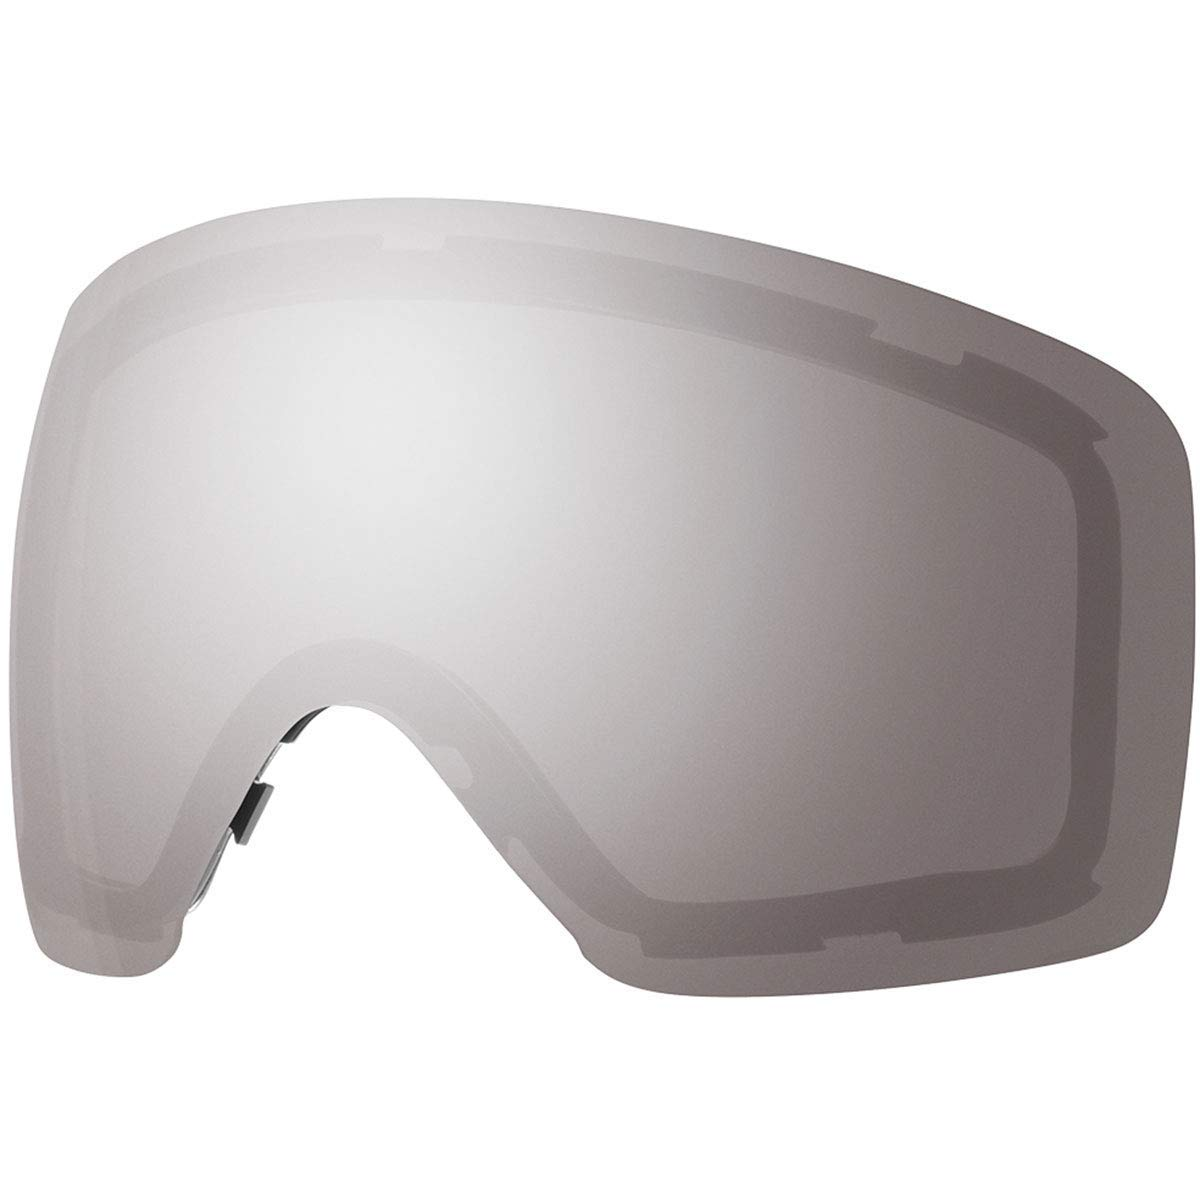 d87dbffb11 Get Quotations · Smith Optics Skyline Adult Replacement Lense Snow Goggles  Accessories - Chromapop Sun Platinum Mirror One